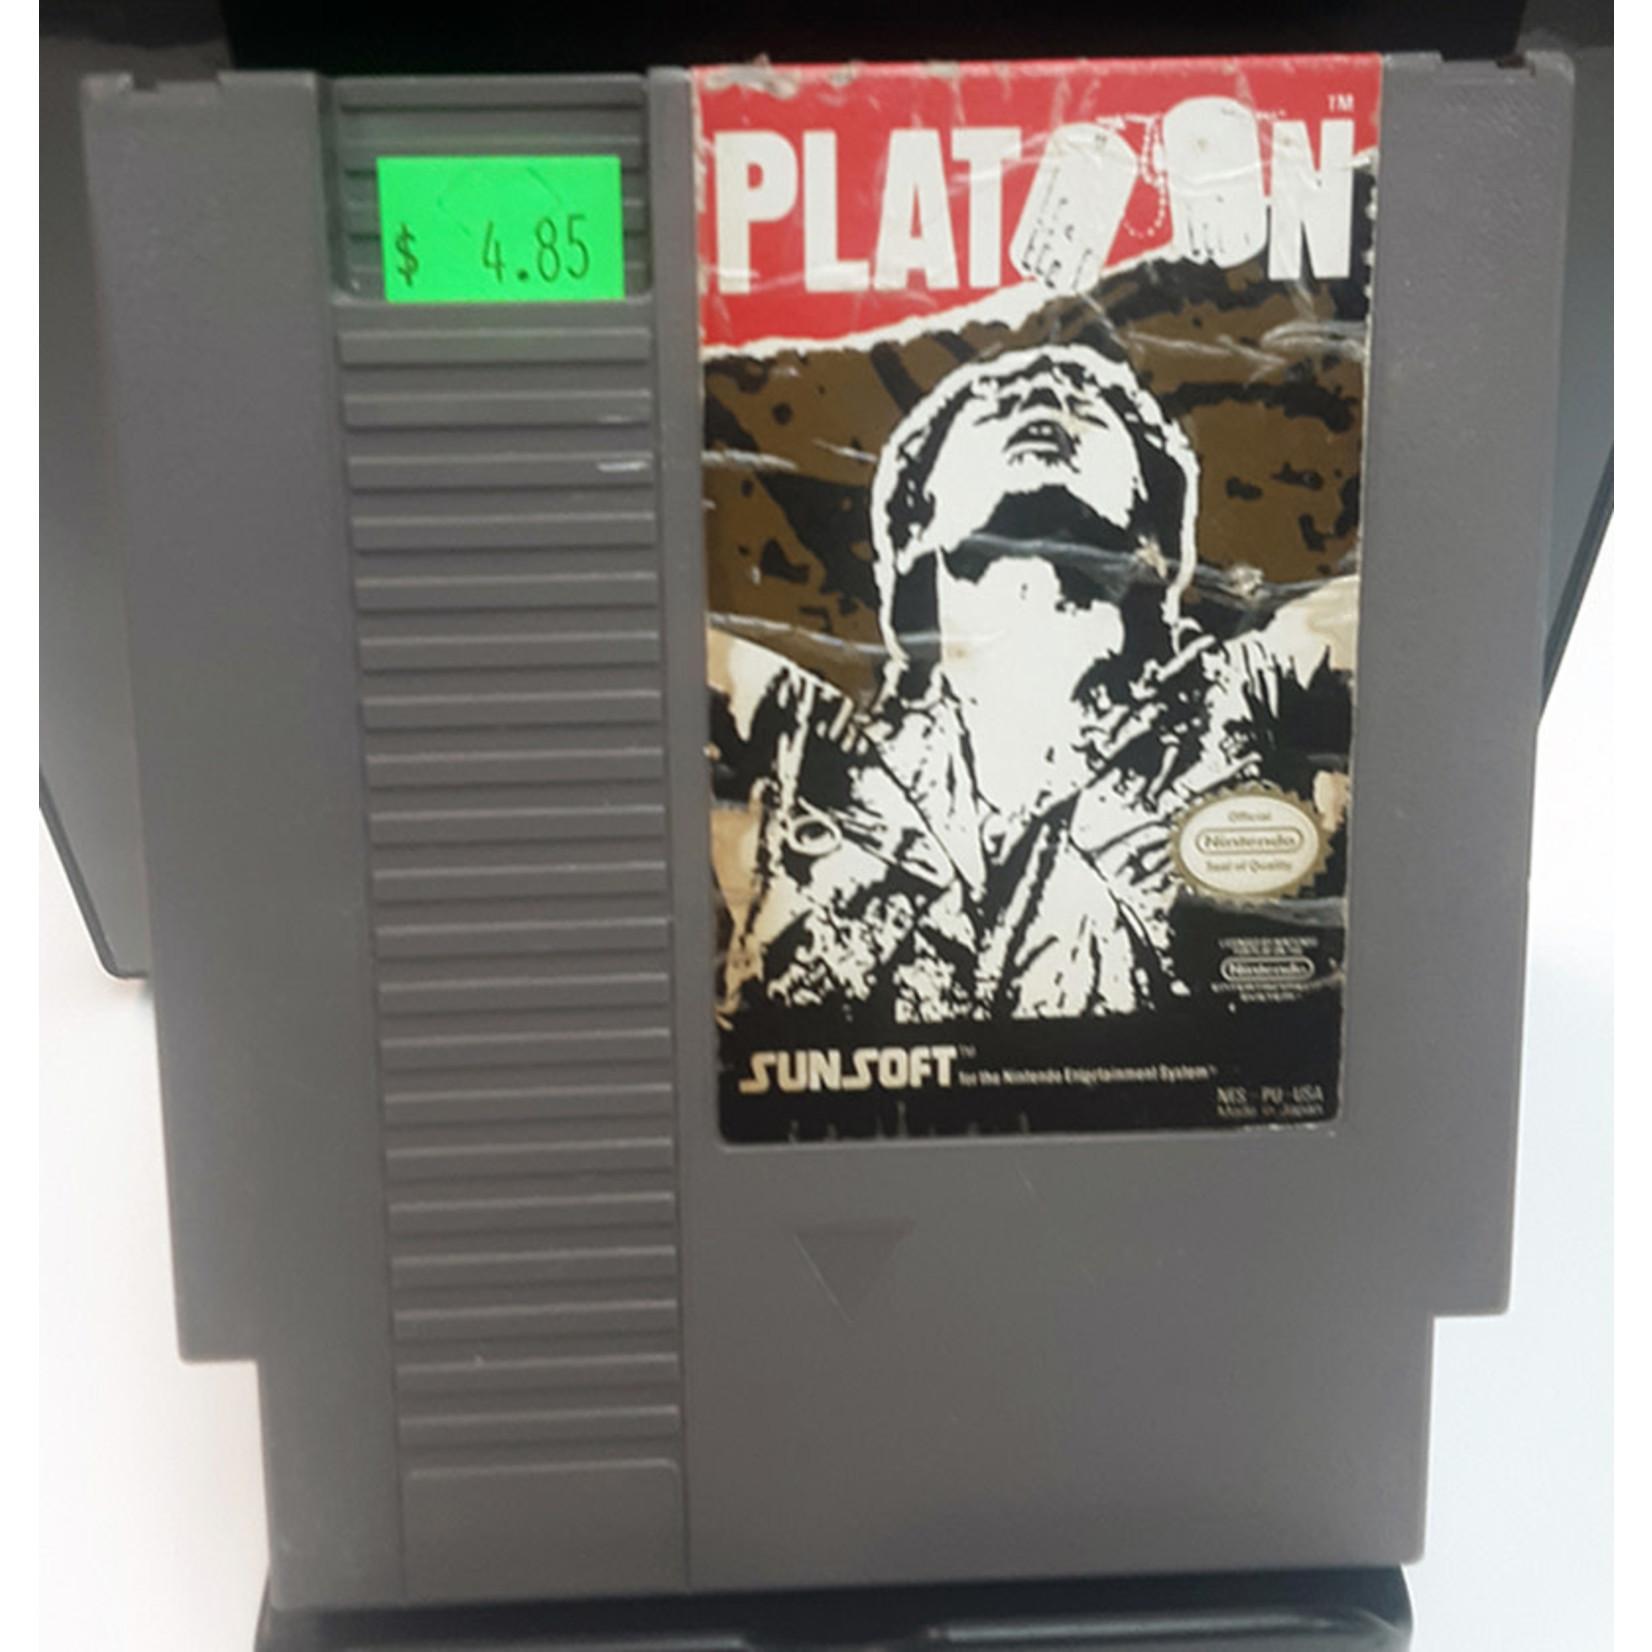 NESu-PLATOON (cartridge)